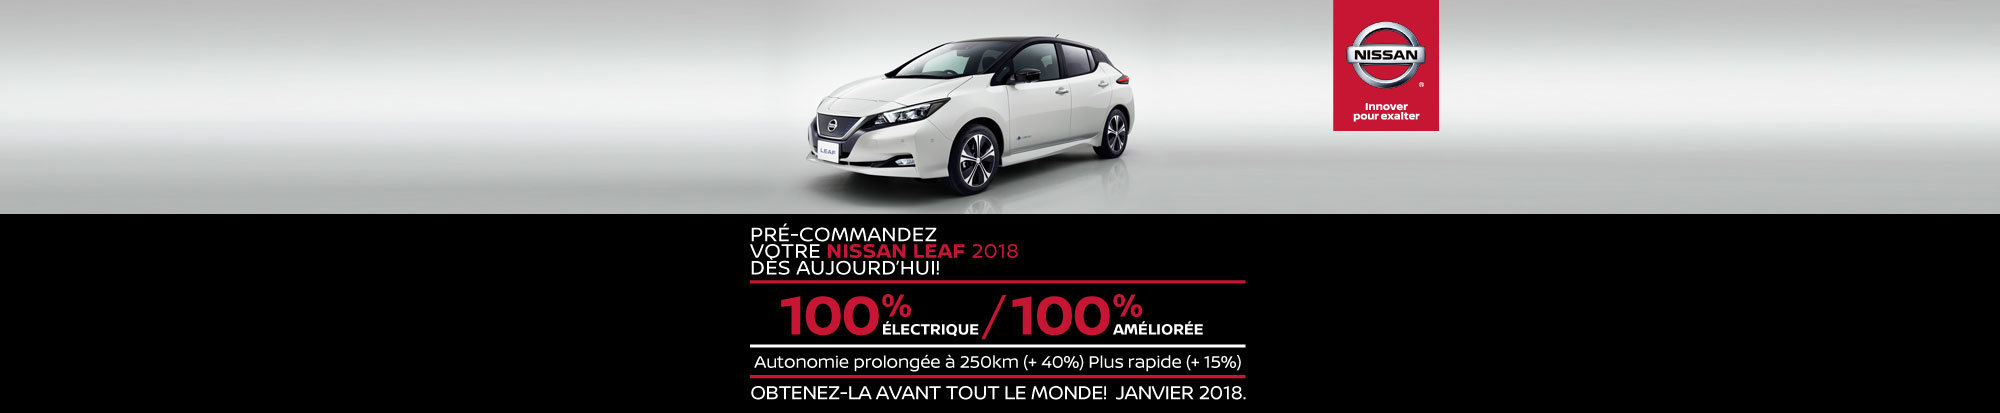 Nissan Leaf 2018 web